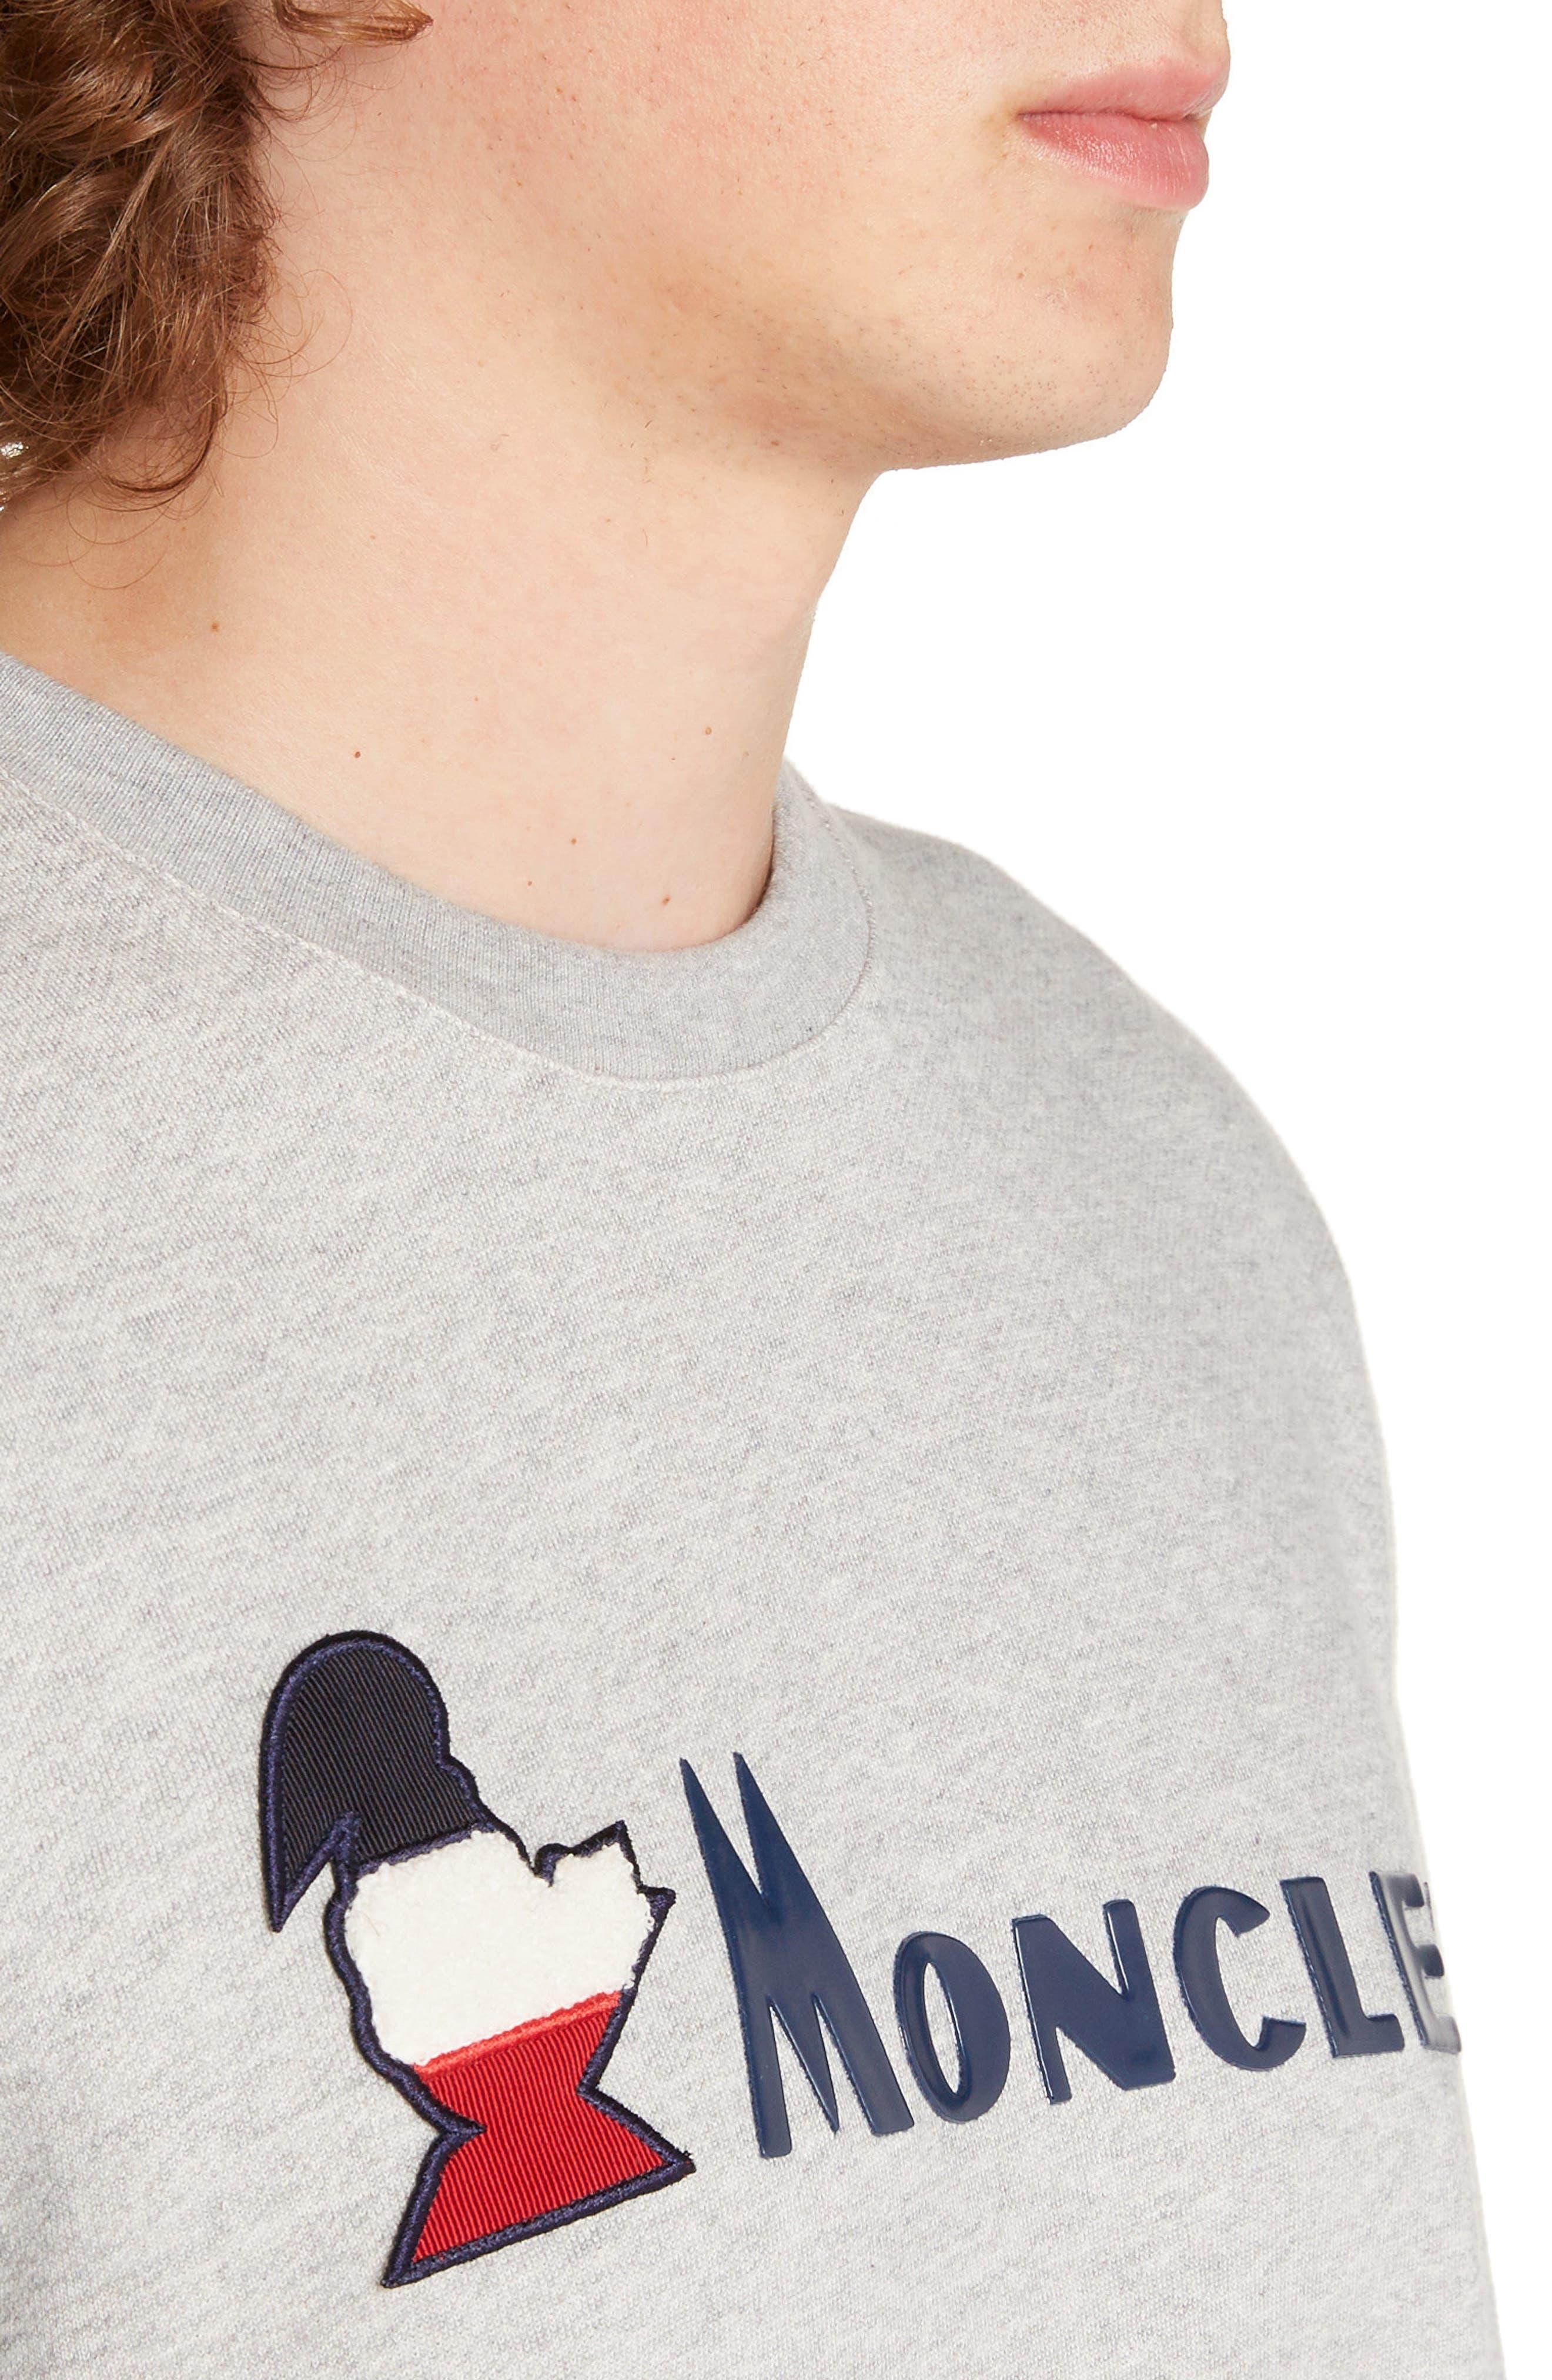 MONCLER,                             Logo Crewneck Sweatshirt,                             Alternate thumbnail 4, color,                             DARK GREY